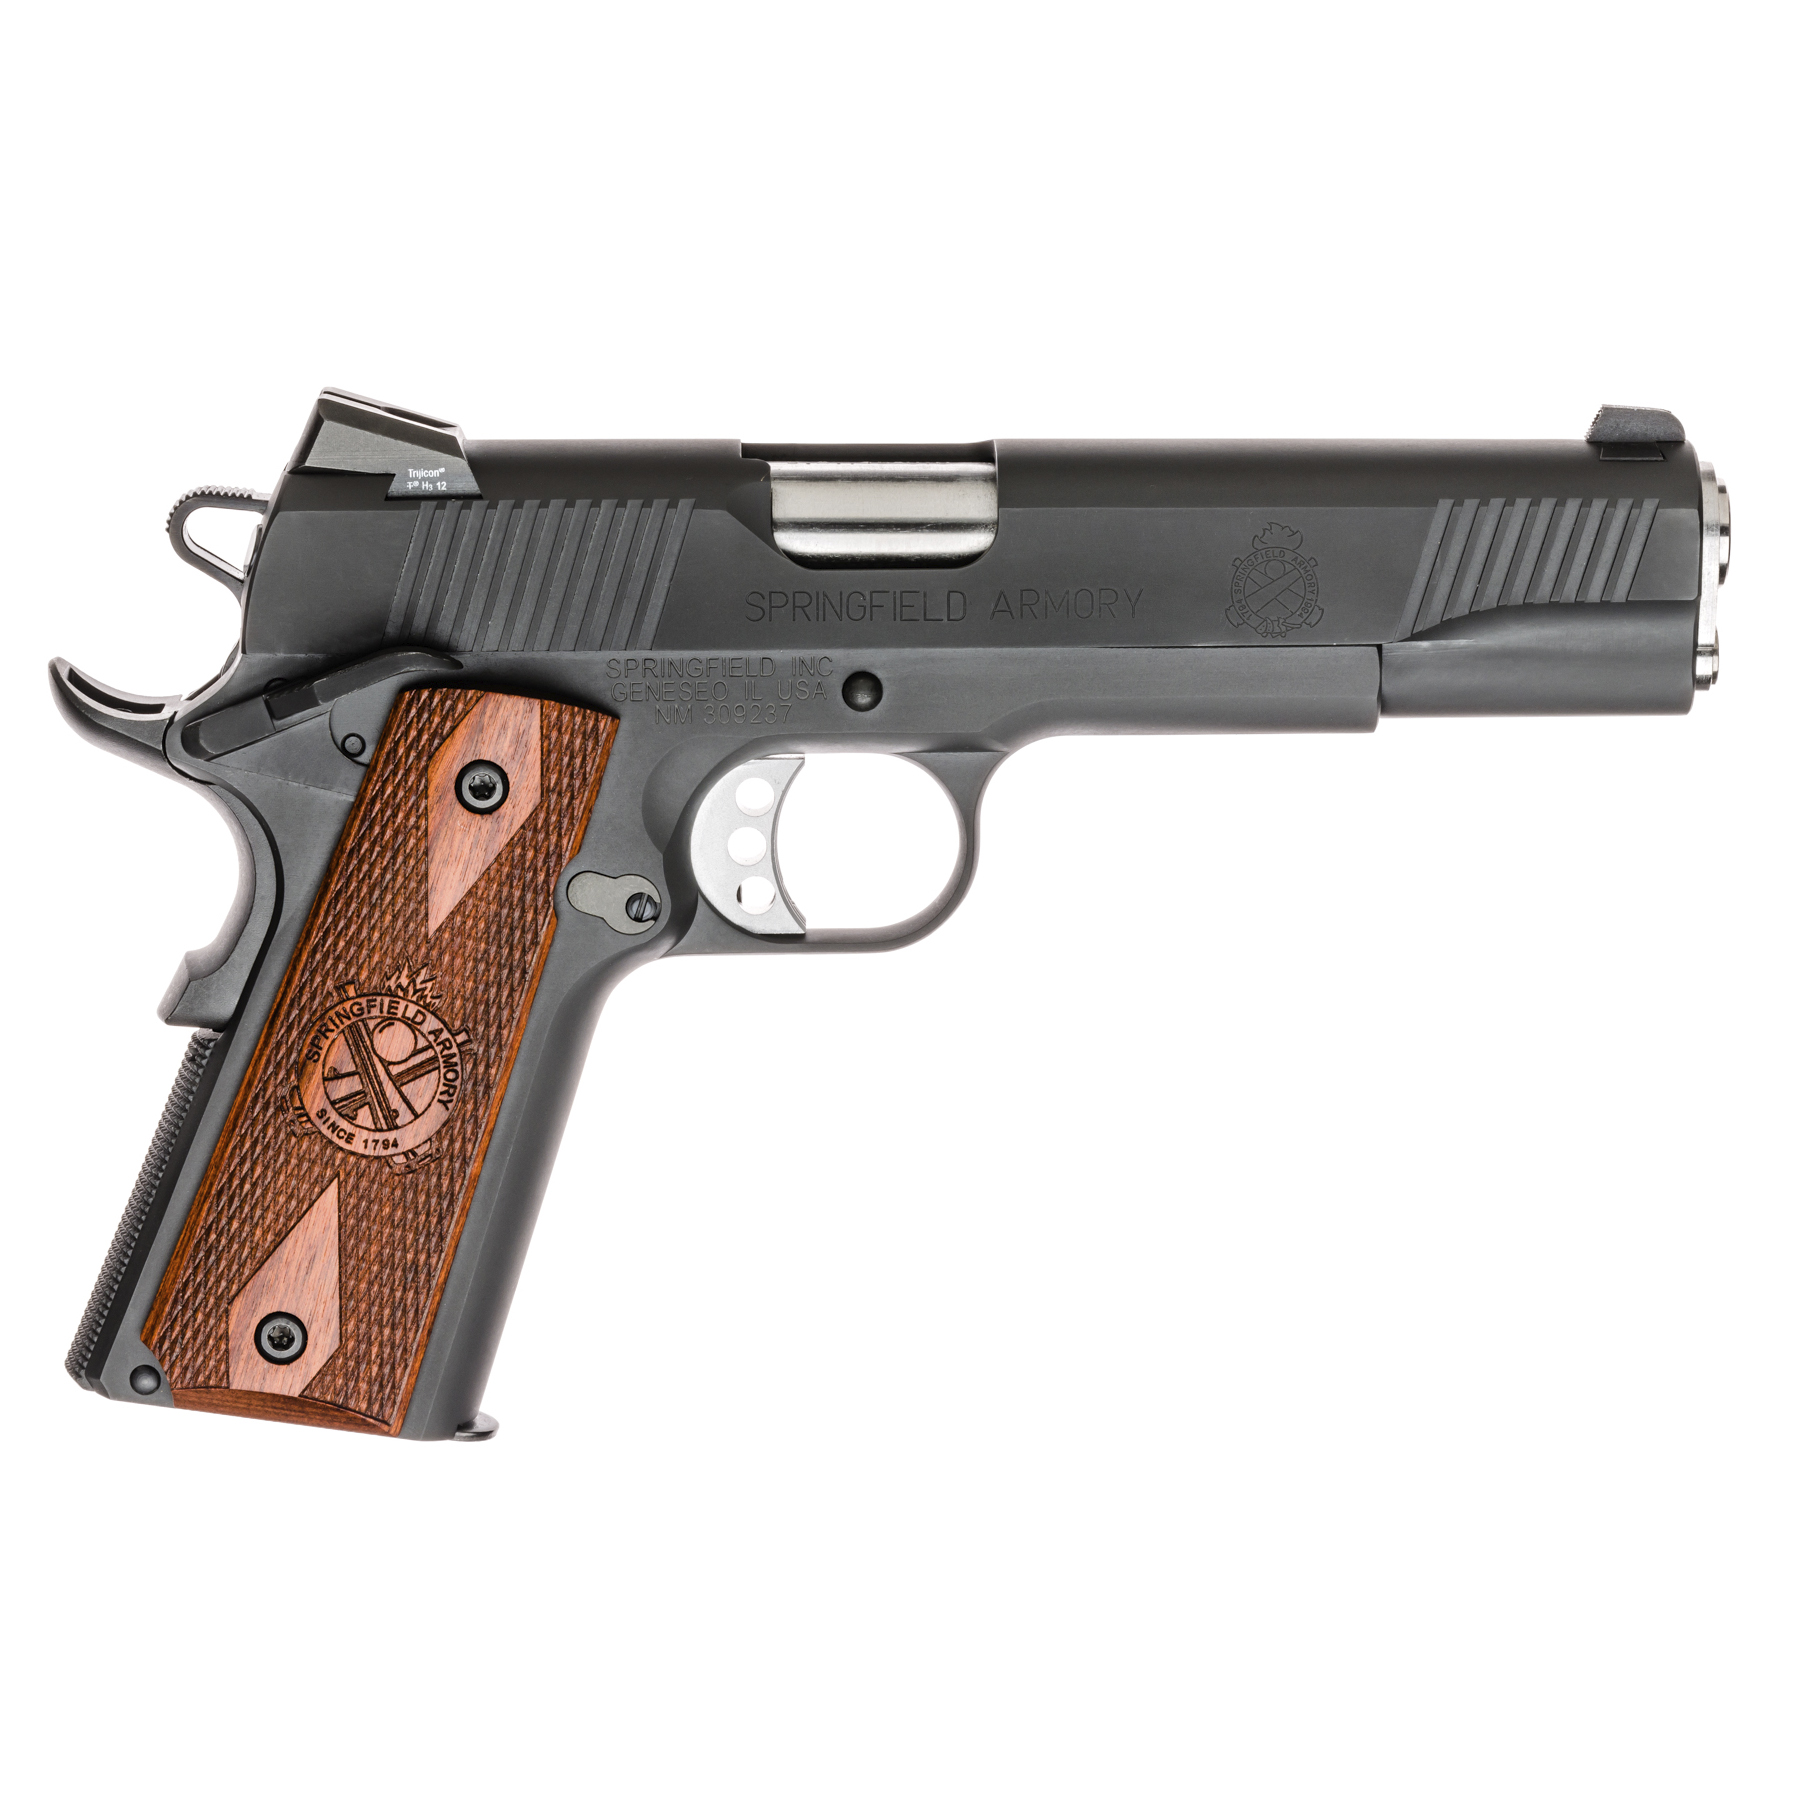 Springfield 1911 Loaded Parkerized Handgun